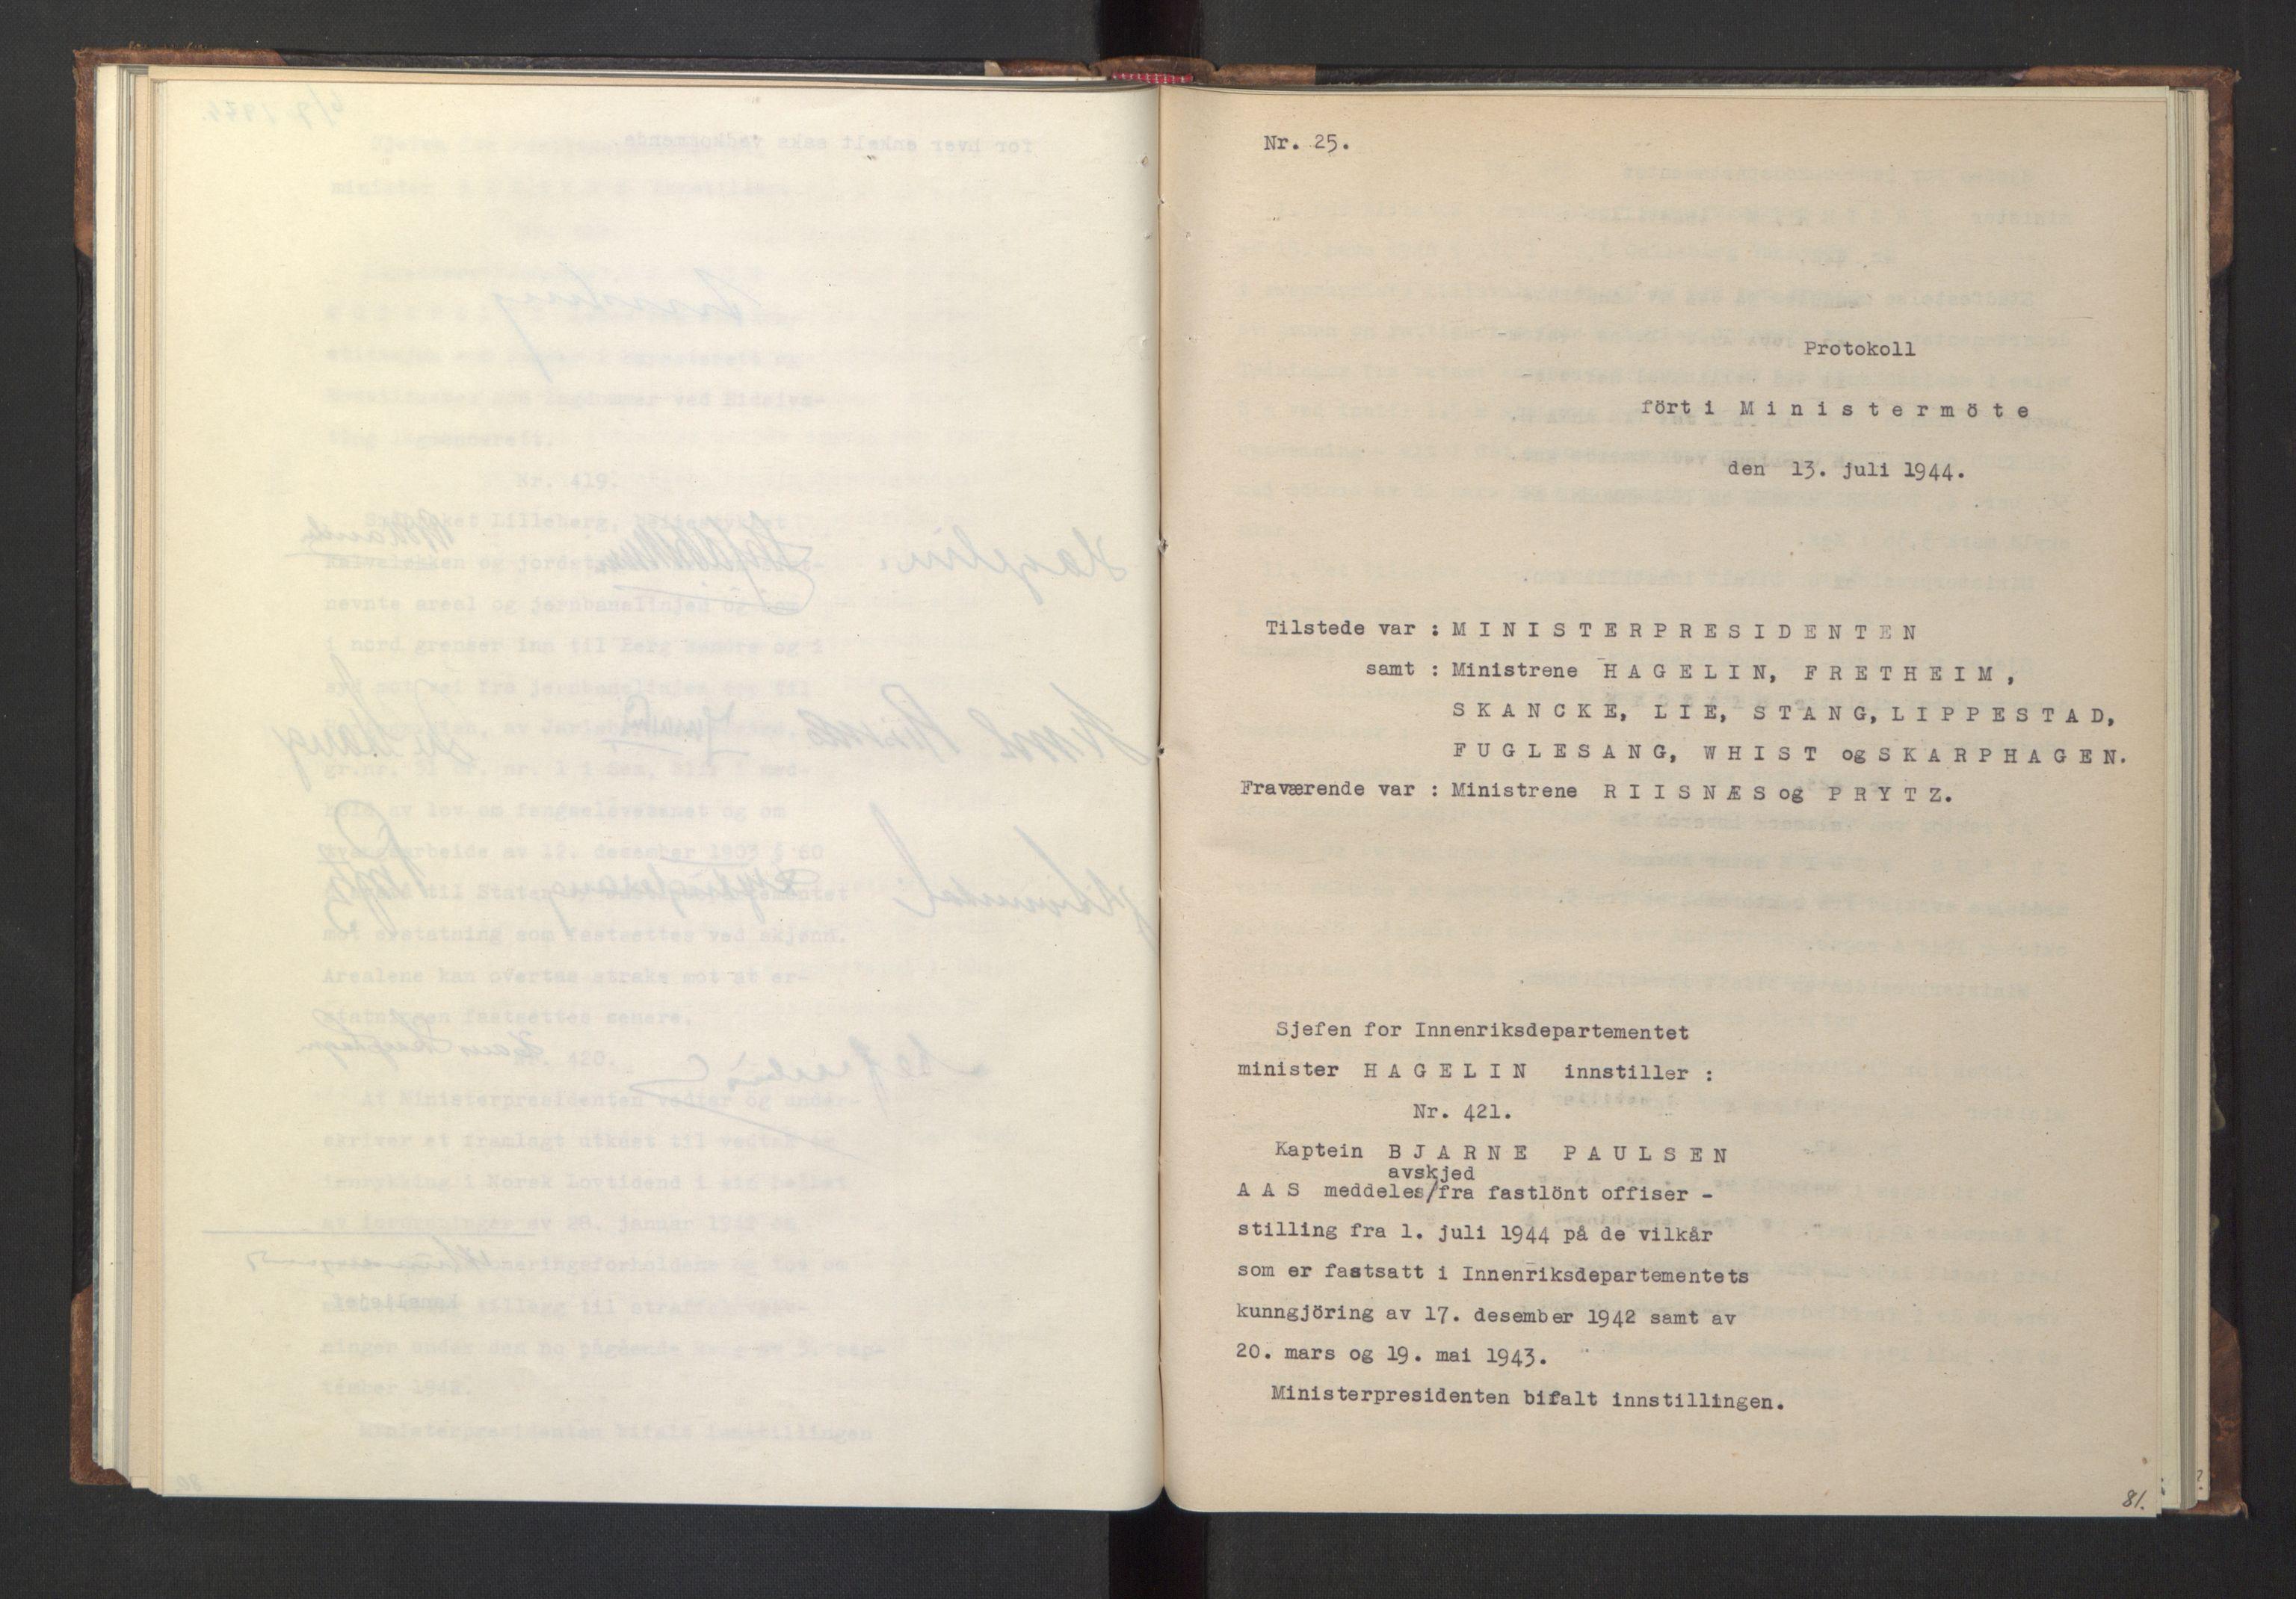 RA, NS-administrasjonen 1940-1945 (Statsrådsekretariatet, de kommisariske statsråder mm), D/Da/L0005: Protokoll fra ministermøter, 1944, s. 80b-81a